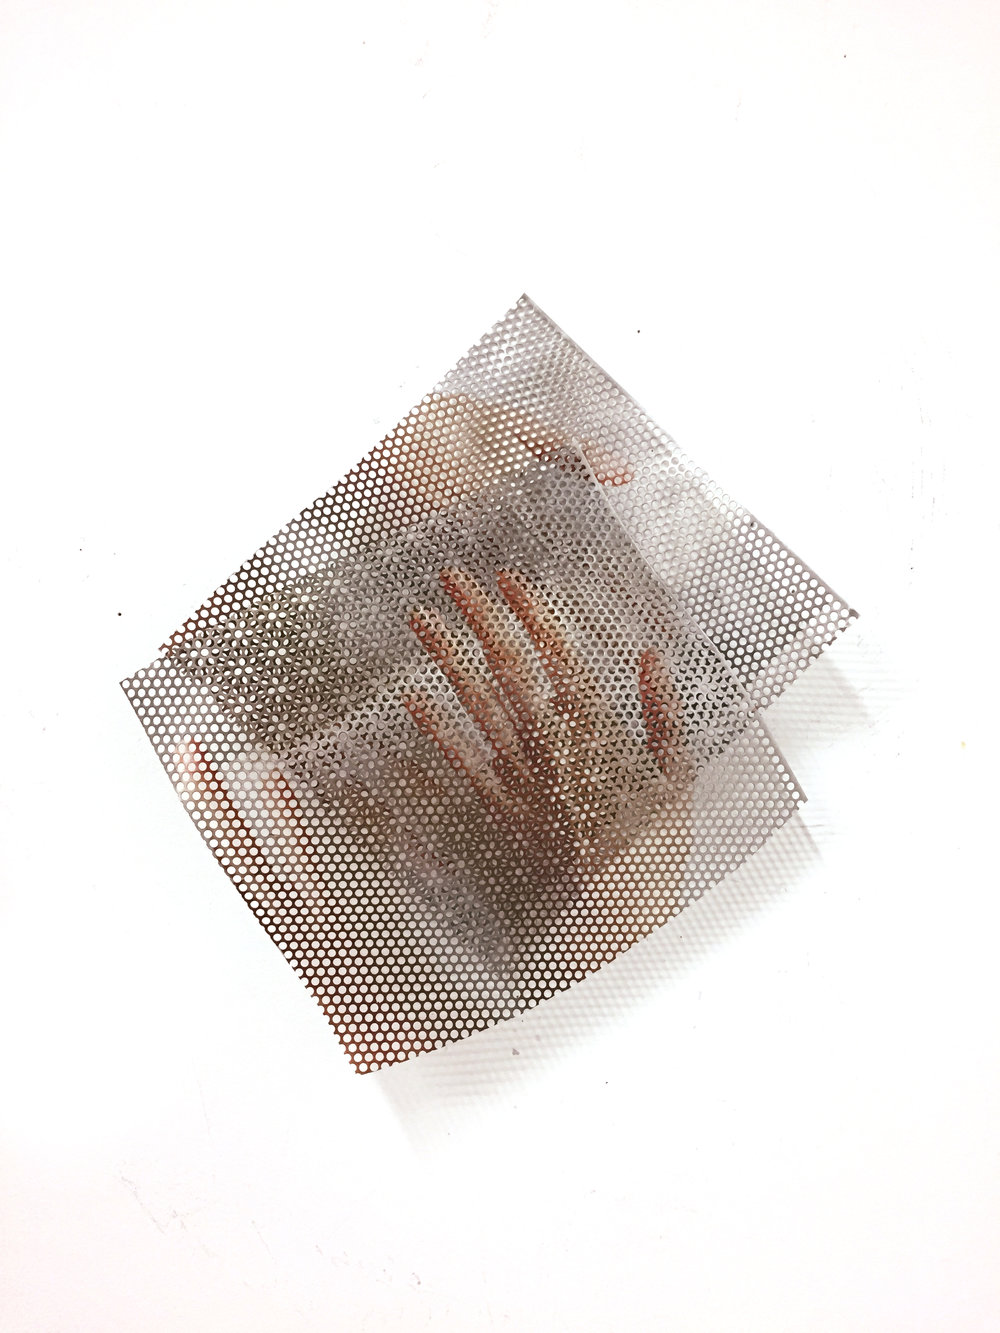 JACQUELINE SHERLOCK NORHEIM  Slip, 2017  Acrylic ink on aluminum, nail  14 x 20 inches